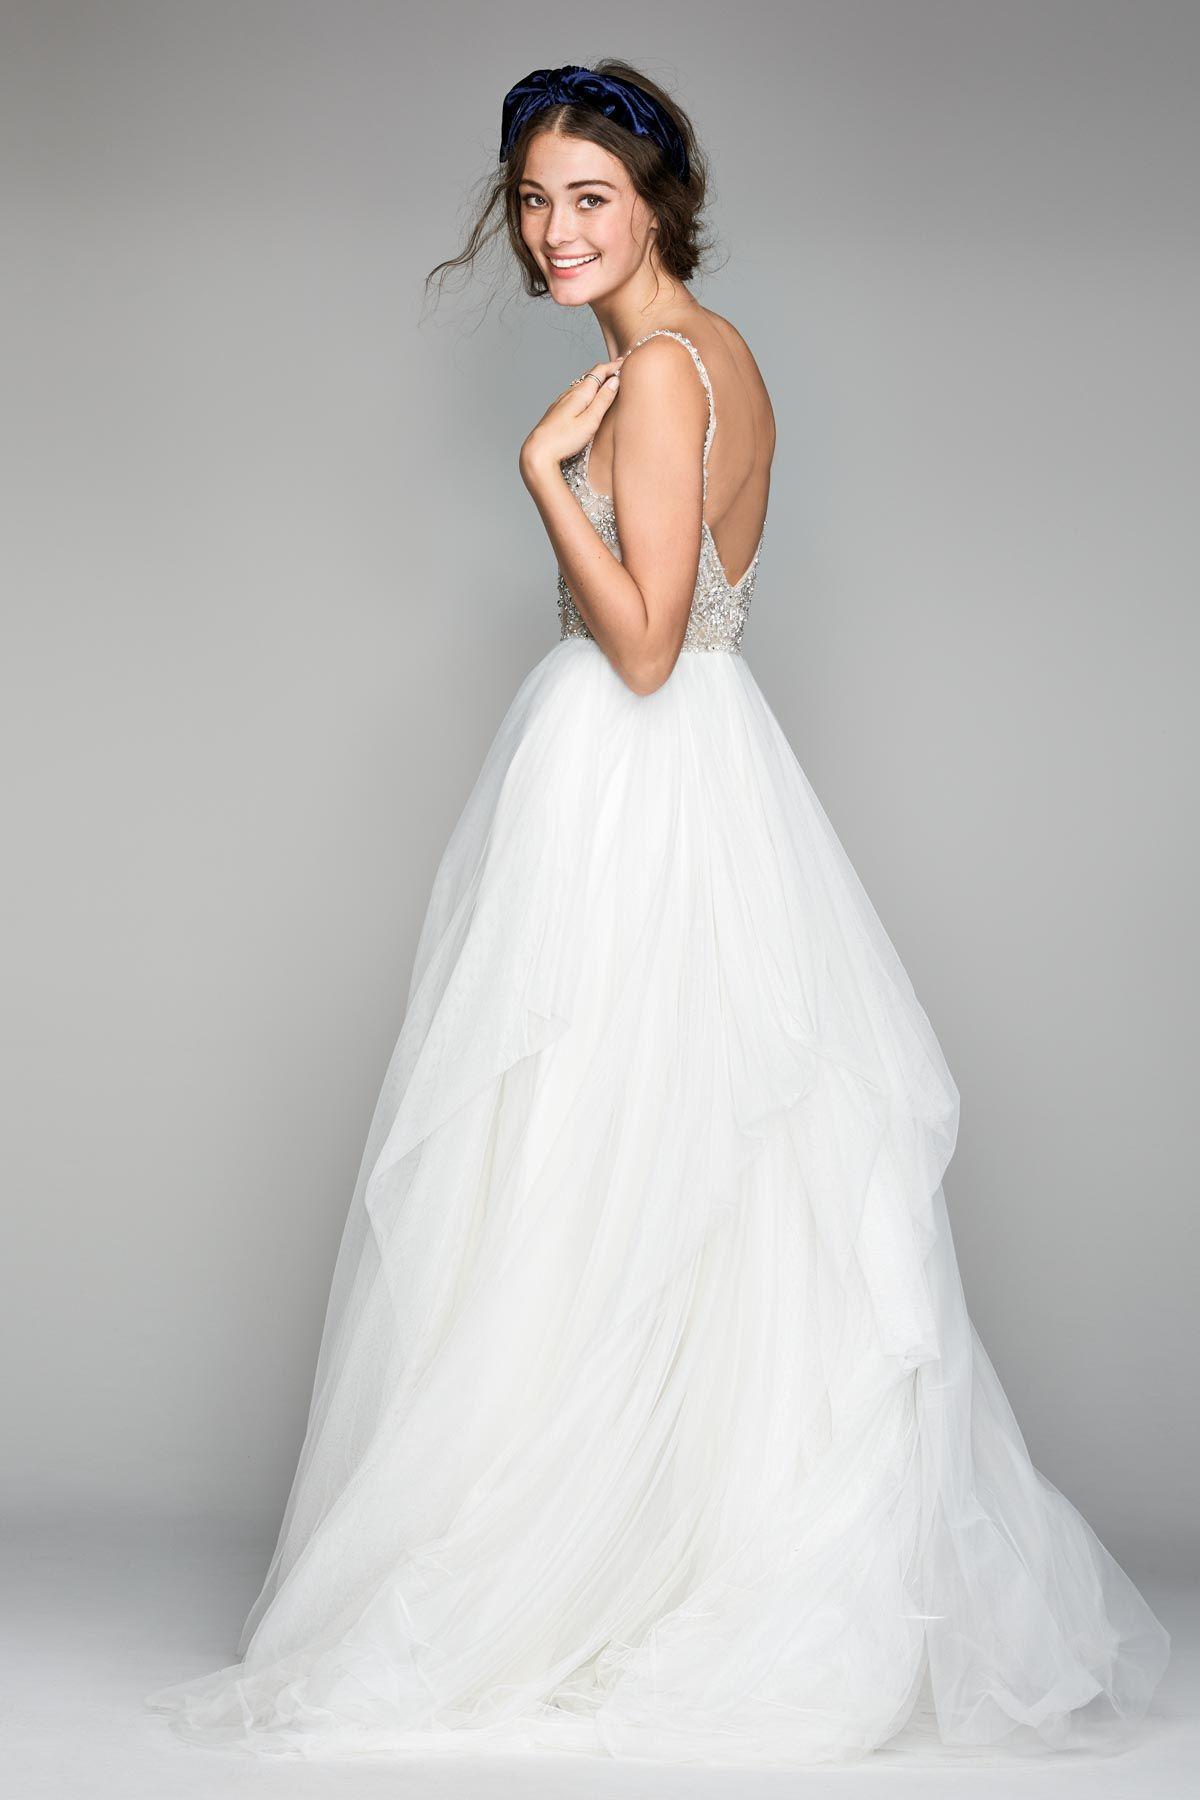 Nova Willowby Watters Available At Lulu's Bridal Boutique Dallas Texas Bohemian Boho Bride A Line V Neck Beaded Straps: Lulus Beaded Bodice Wedding Dress At Websimilar.org